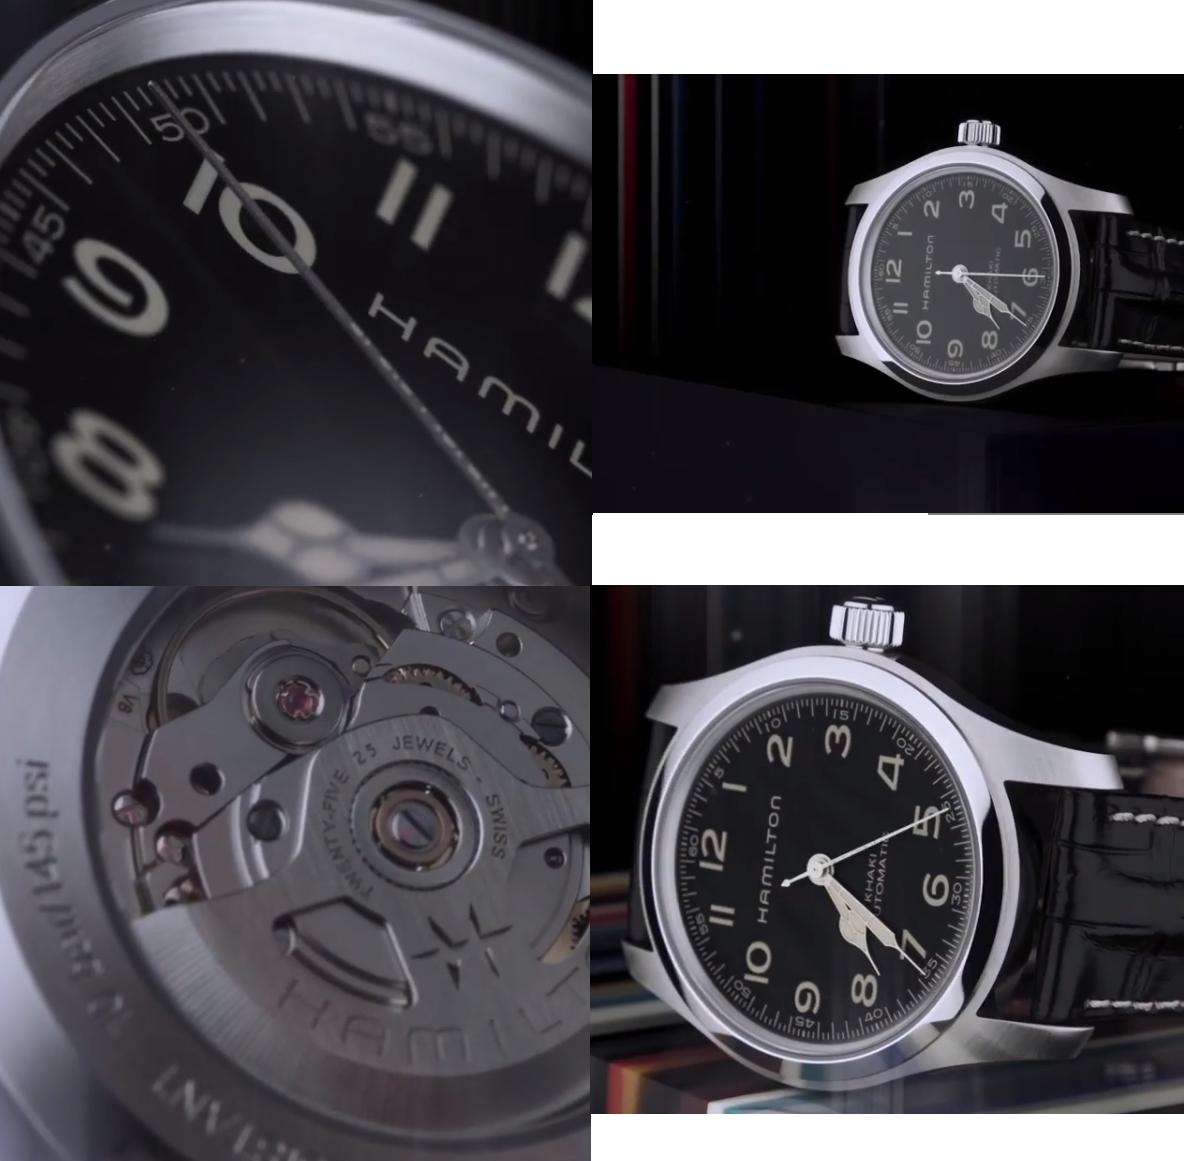 Hamilton nous sortirait enfin la fameuse Murphy's watch? (Interstellar) 190211085050439145